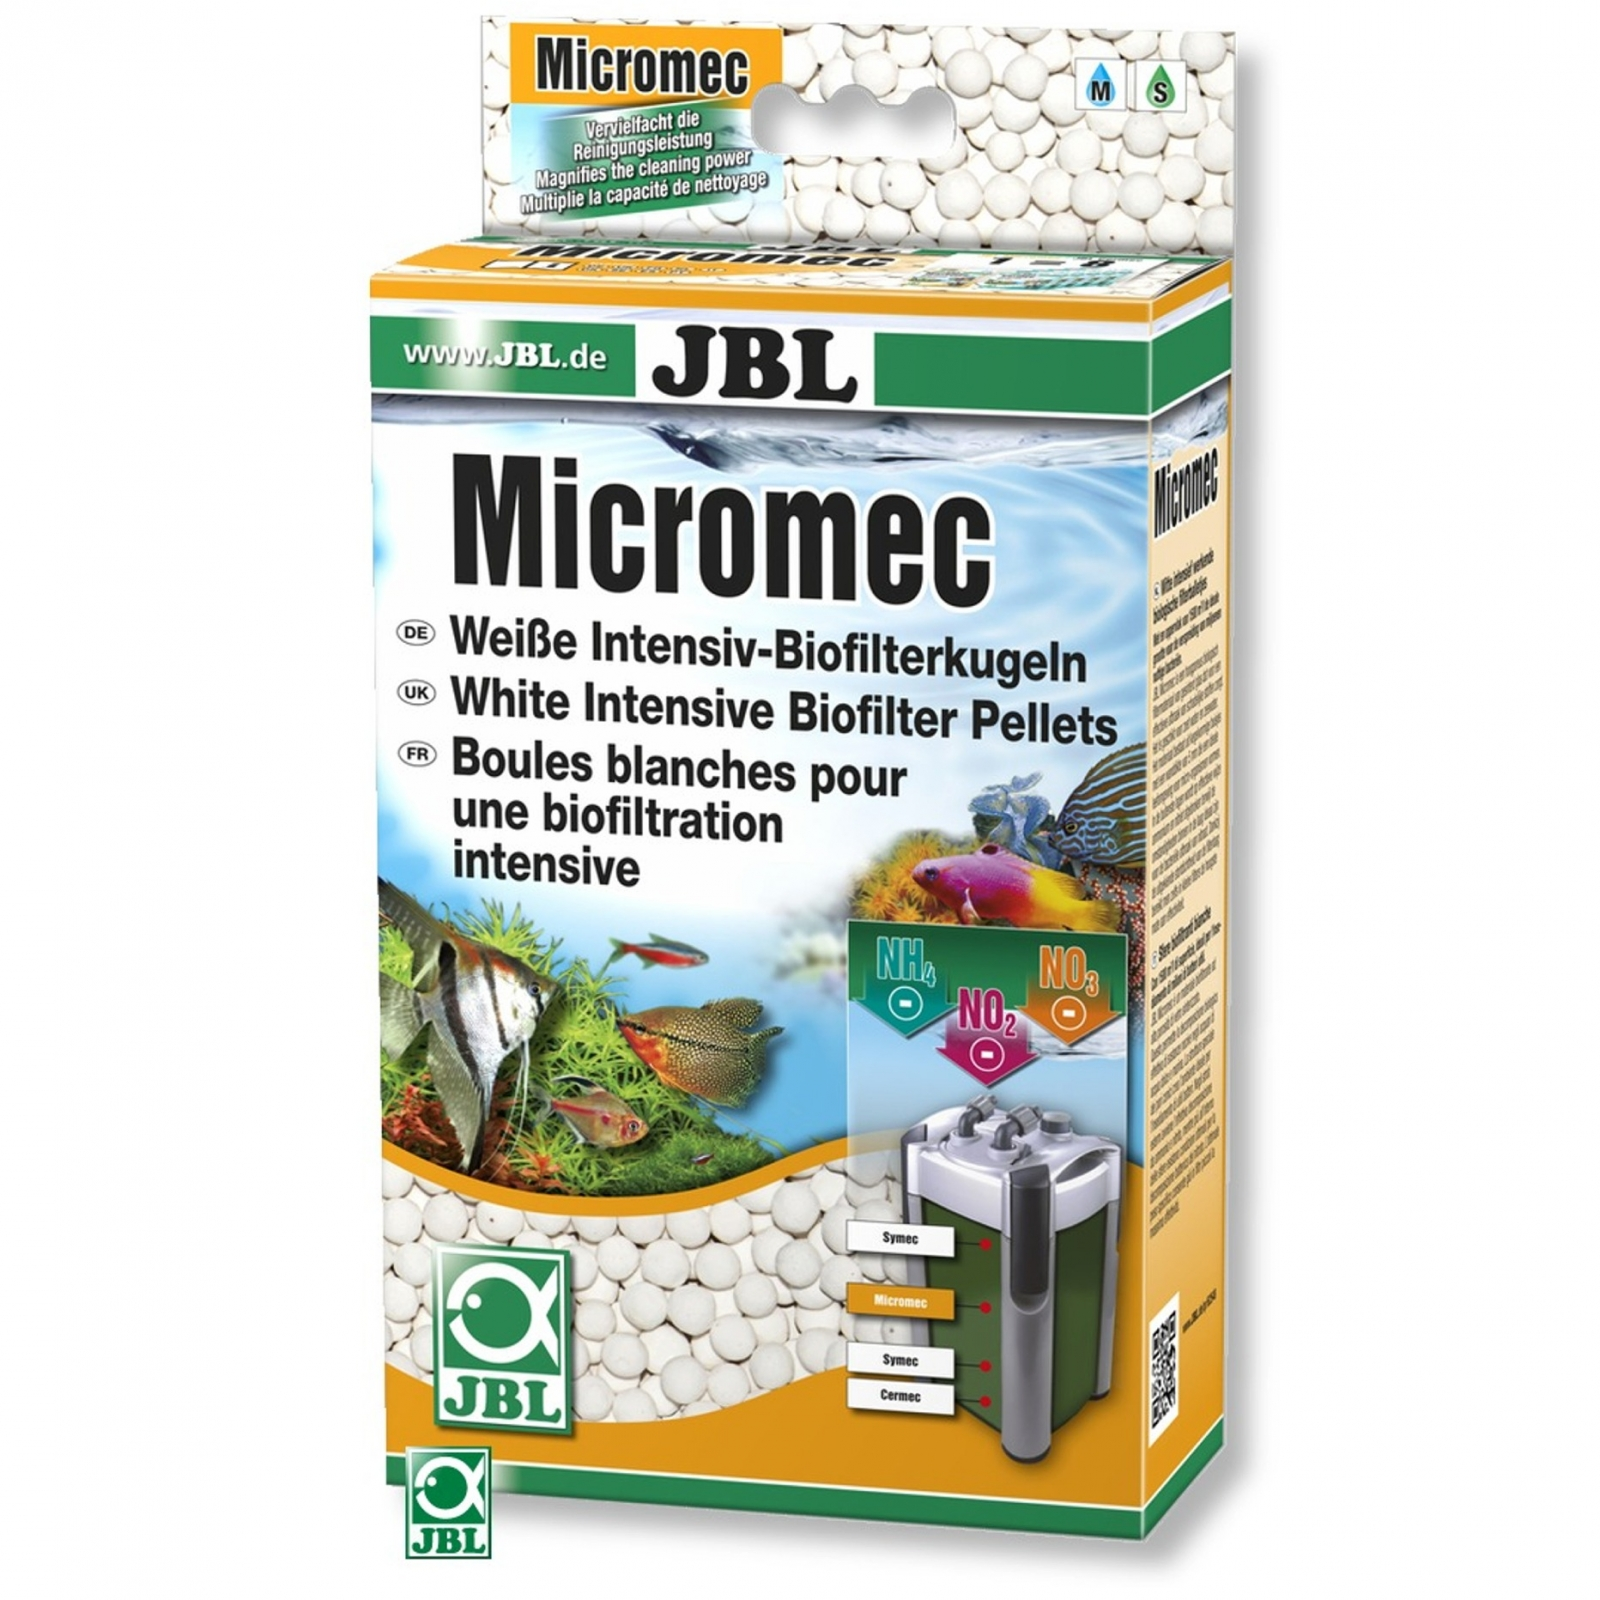 JBL MicroMec 1 L billes blanches de biofiltration intensive